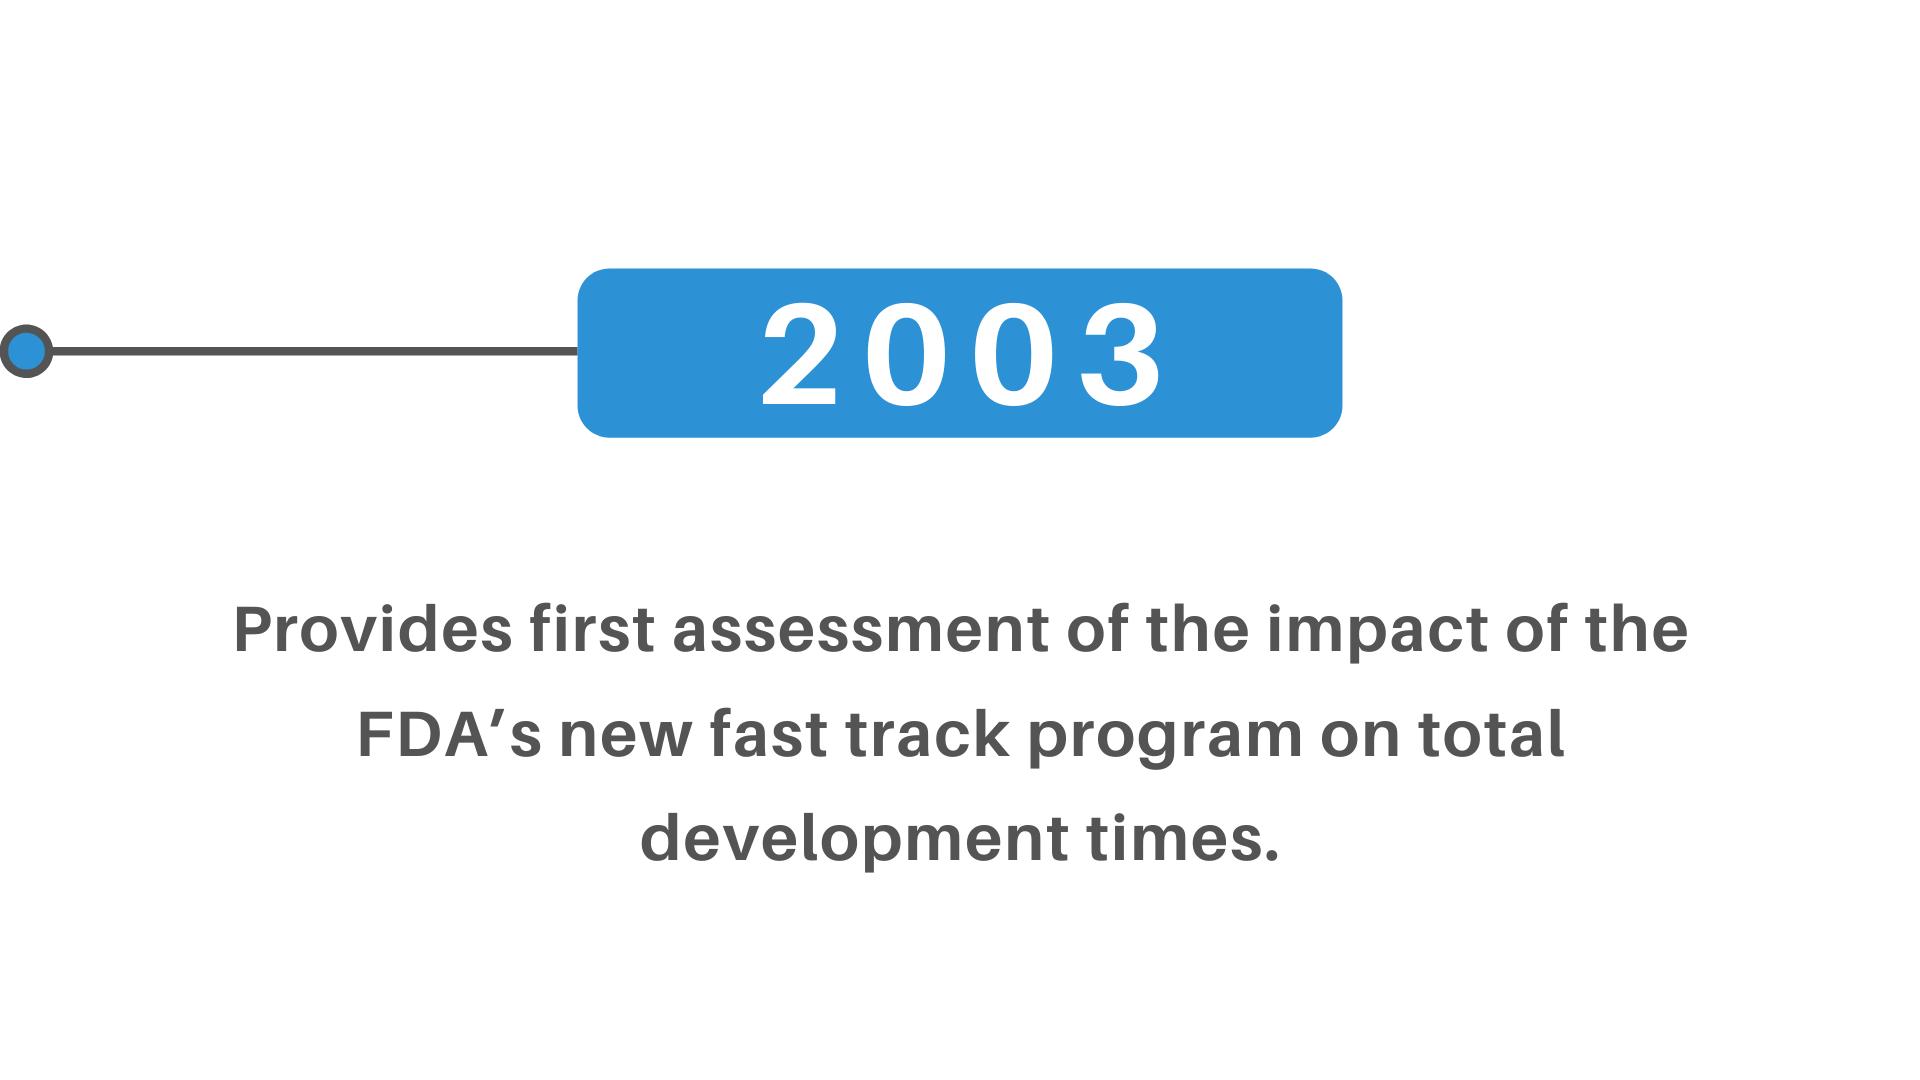 FDA fast track program development times